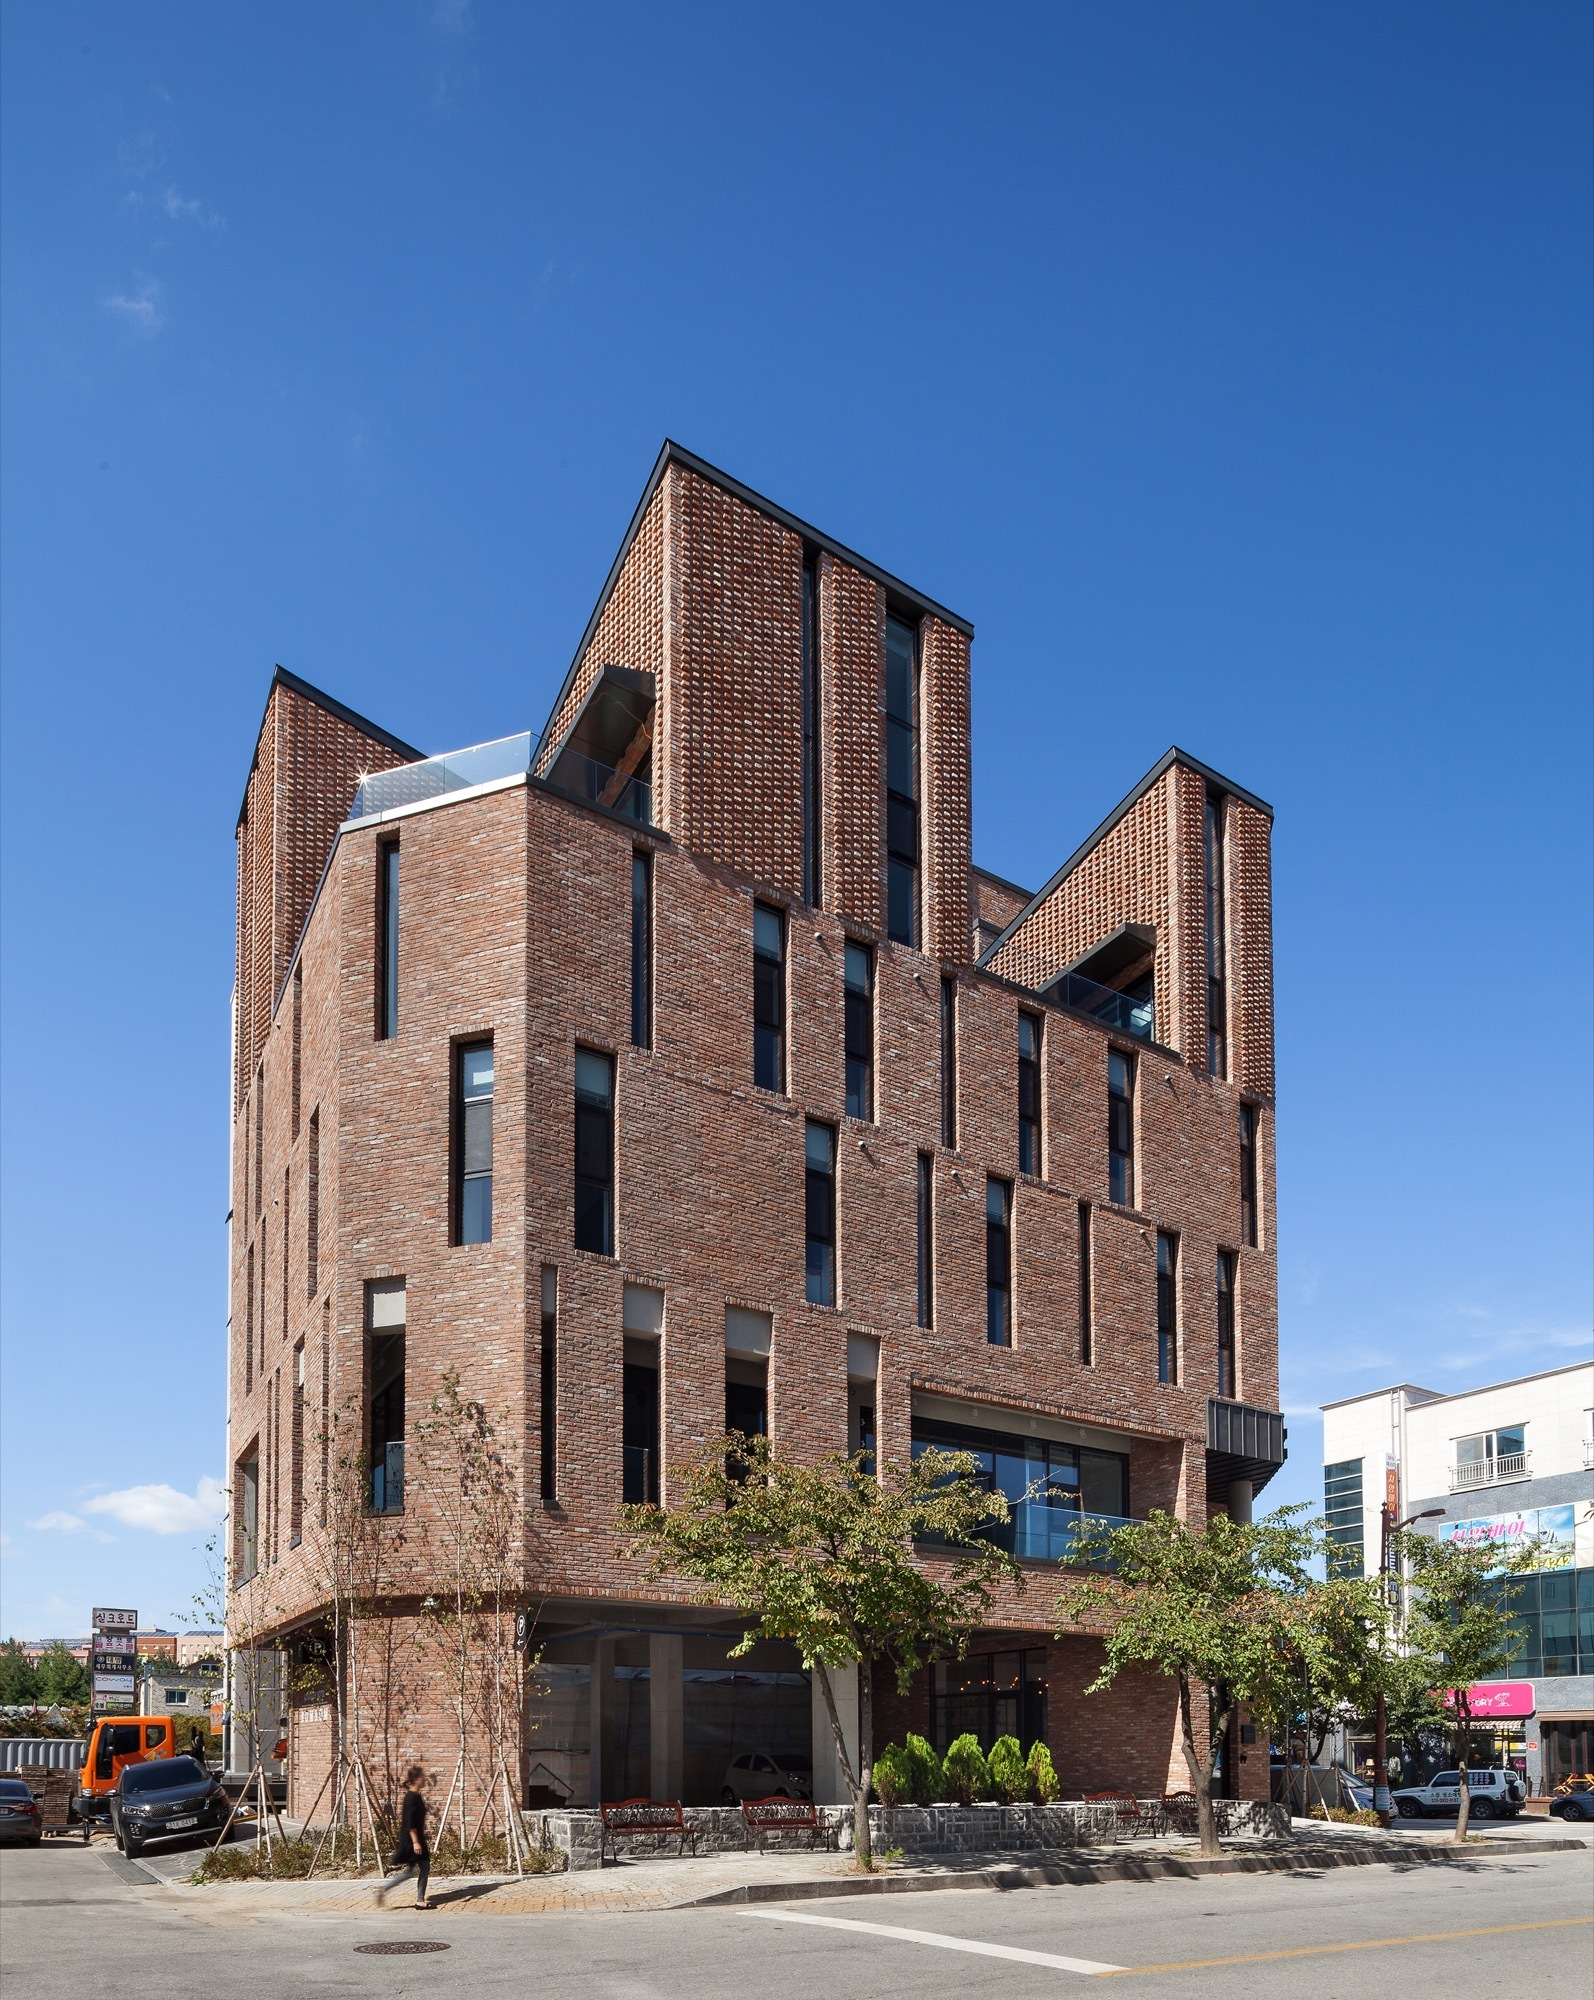 Boutique Hotel: BomBom Boutique Hotel / Architecture Studio YEIN